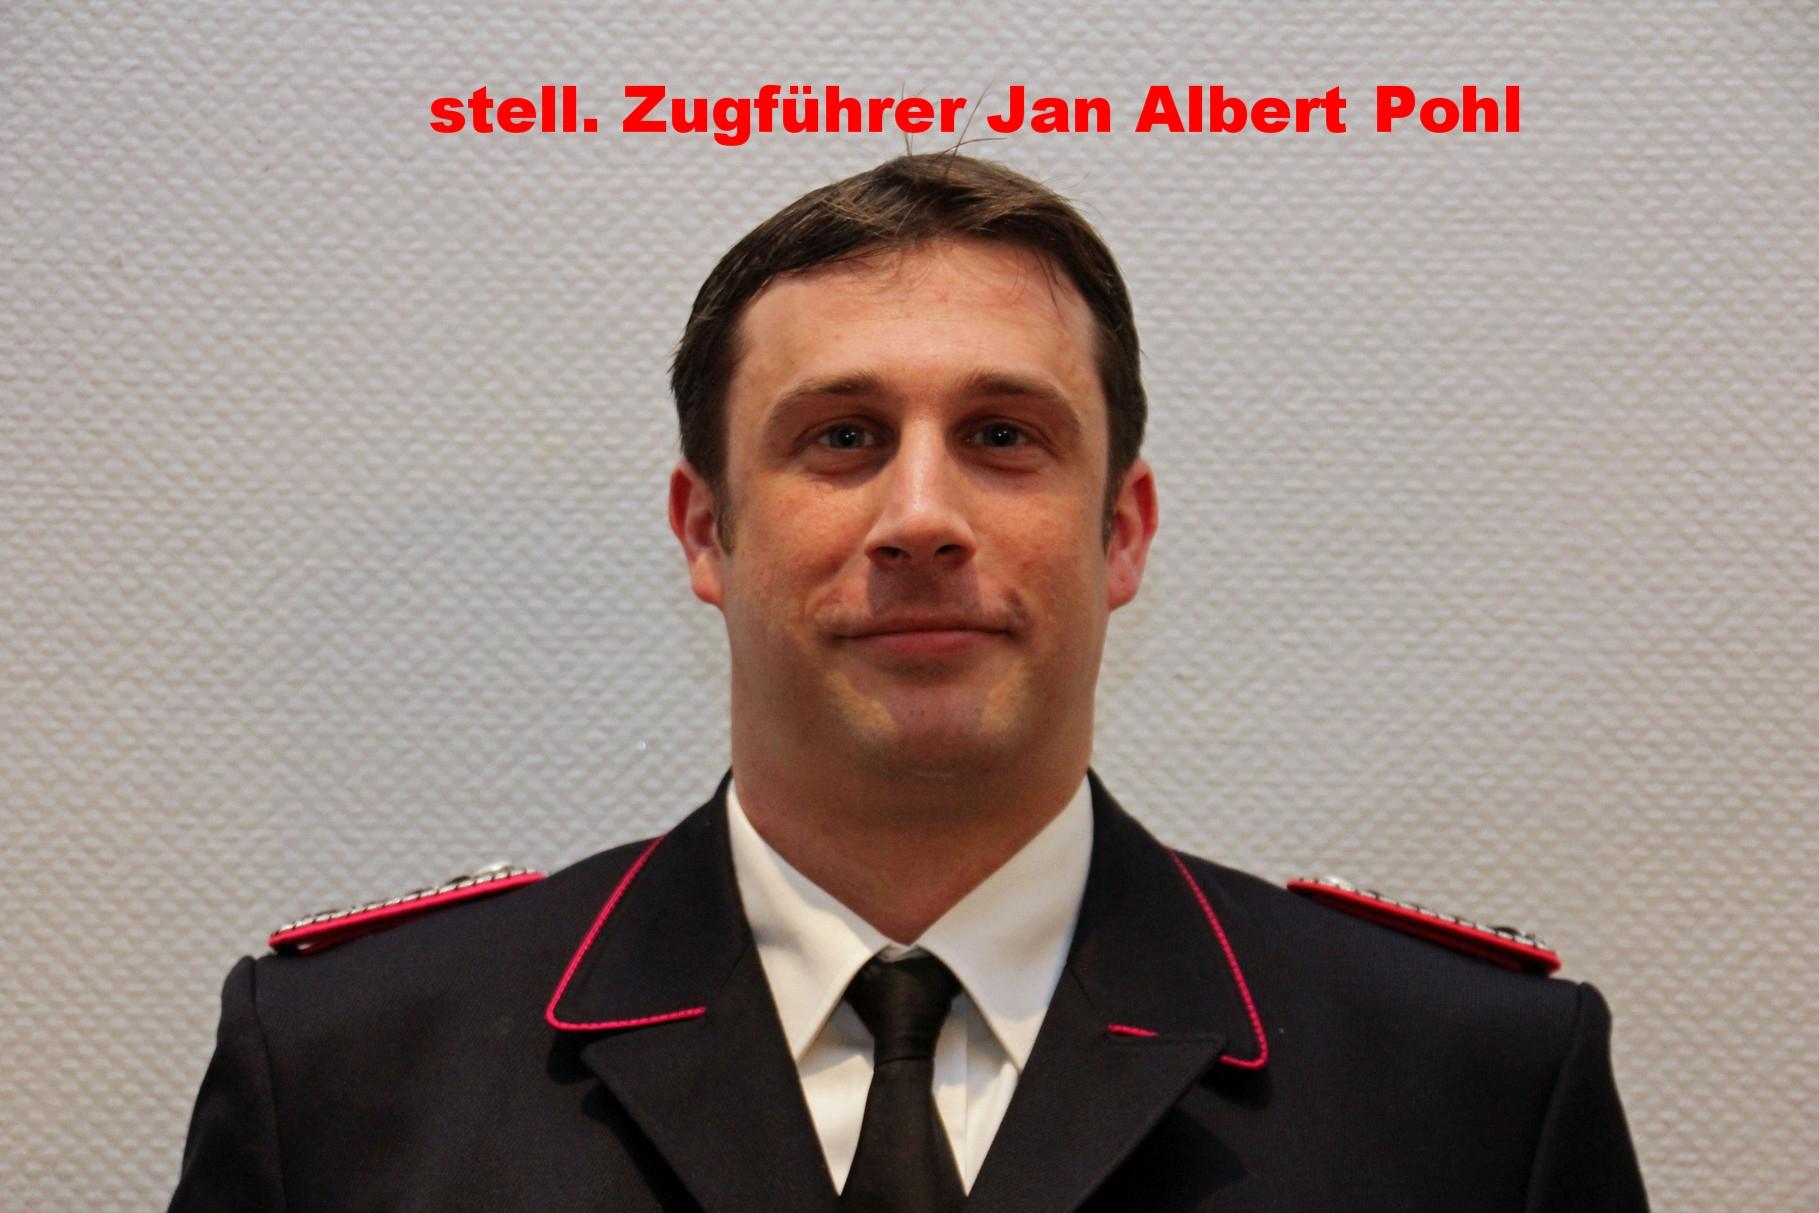 stell. Gruppenführer Jan Albert Pohl